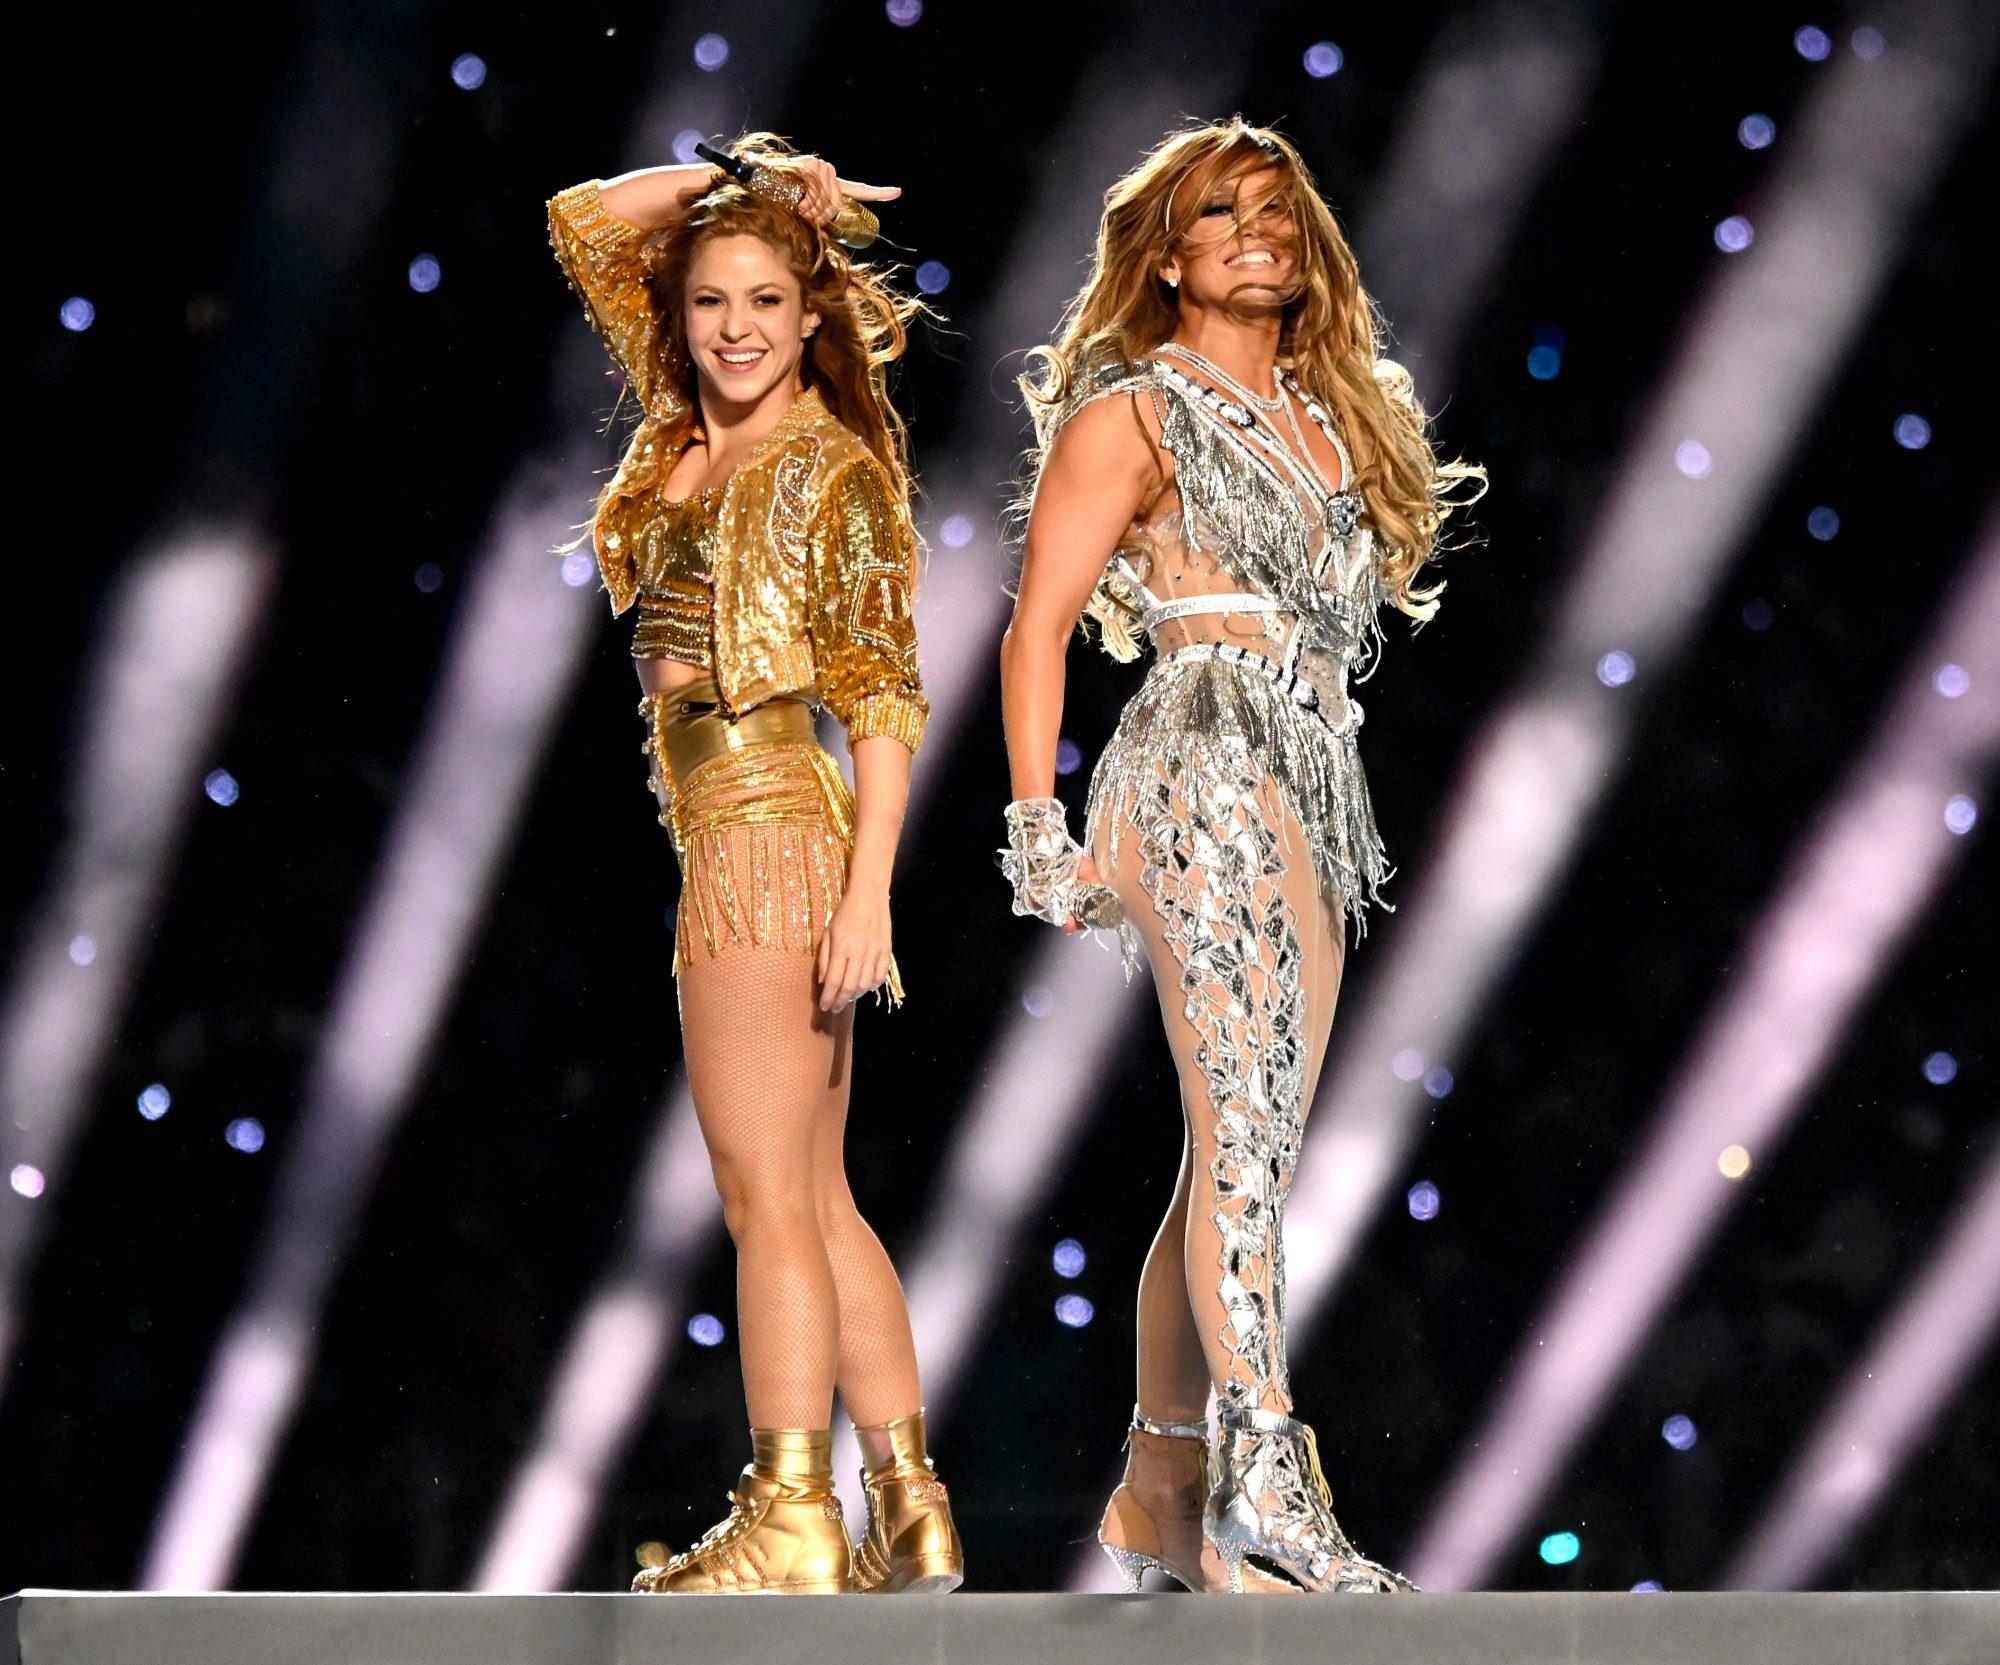 Influyentes - Shakira and JLO